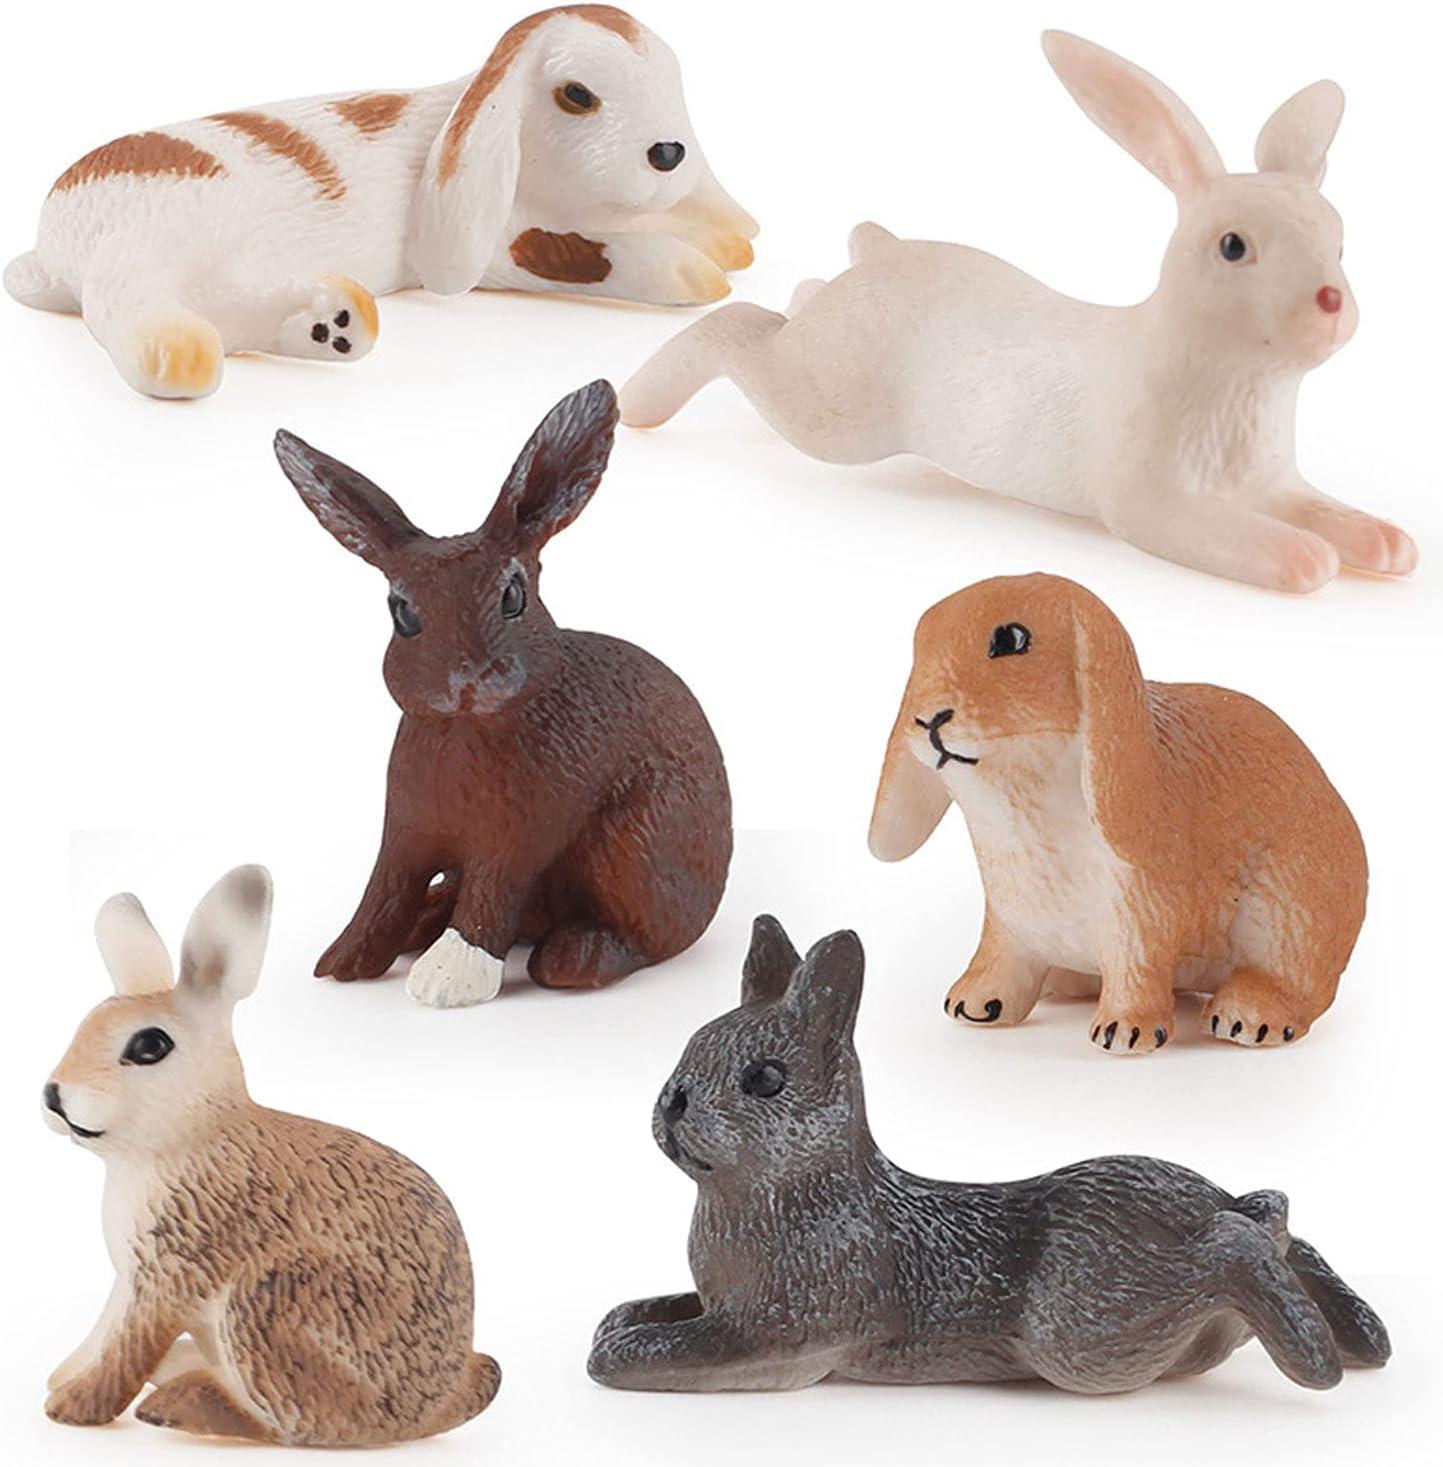 Sales for sale JOKFEICE Animal Figures 6pcs Ranking TOP3 Plastic Action Animals Rabbit Model